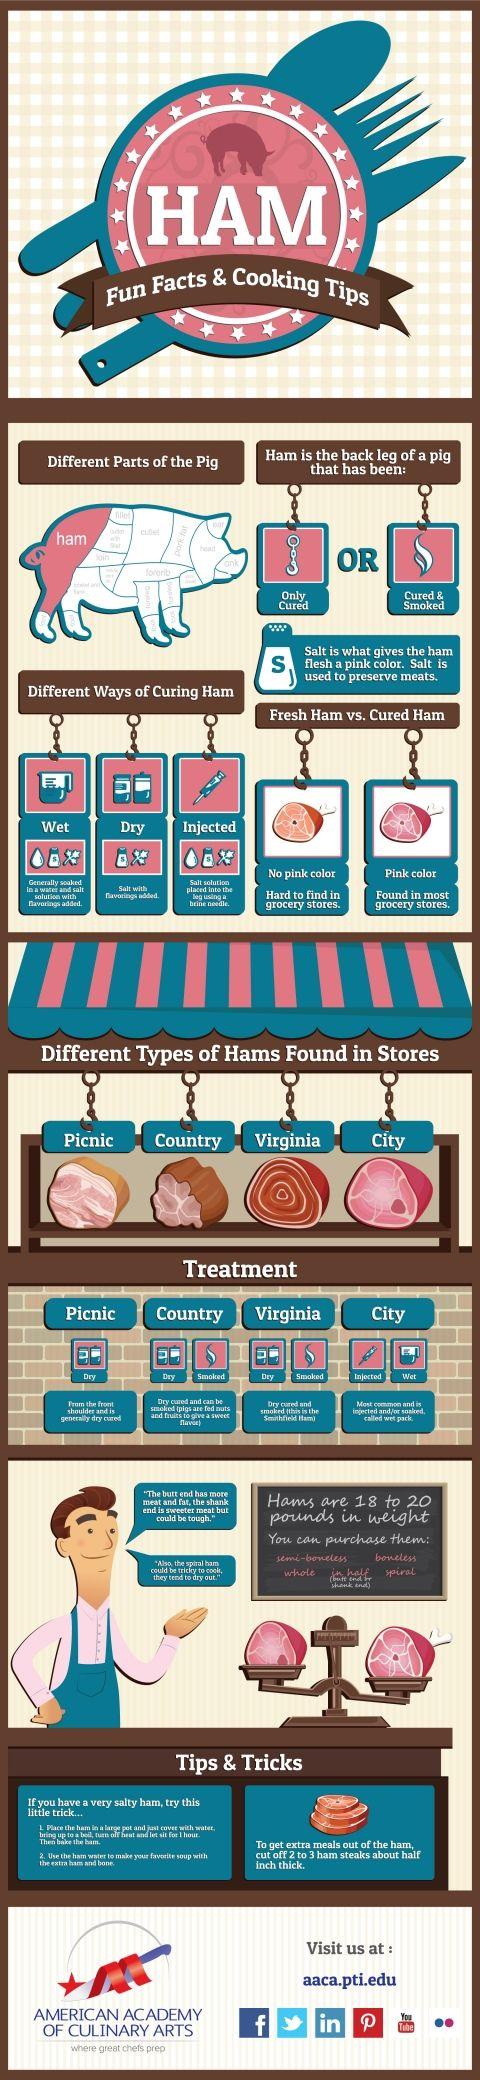 Ham facts & Cooking tips | aaca.pti.edu